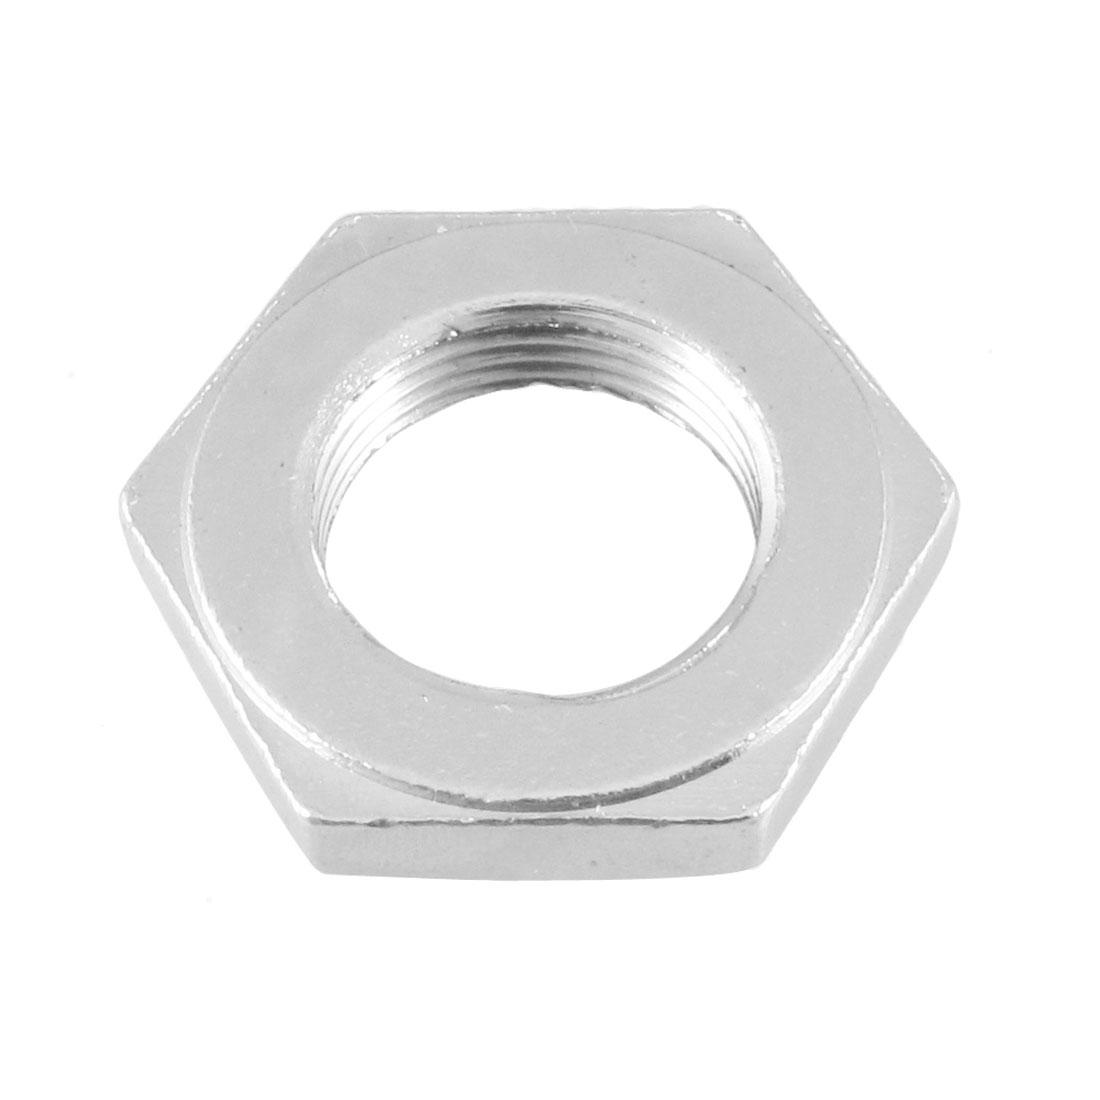 Hexagon Head 22mm Female F Thread Pipe Hose Connector Screw Nut